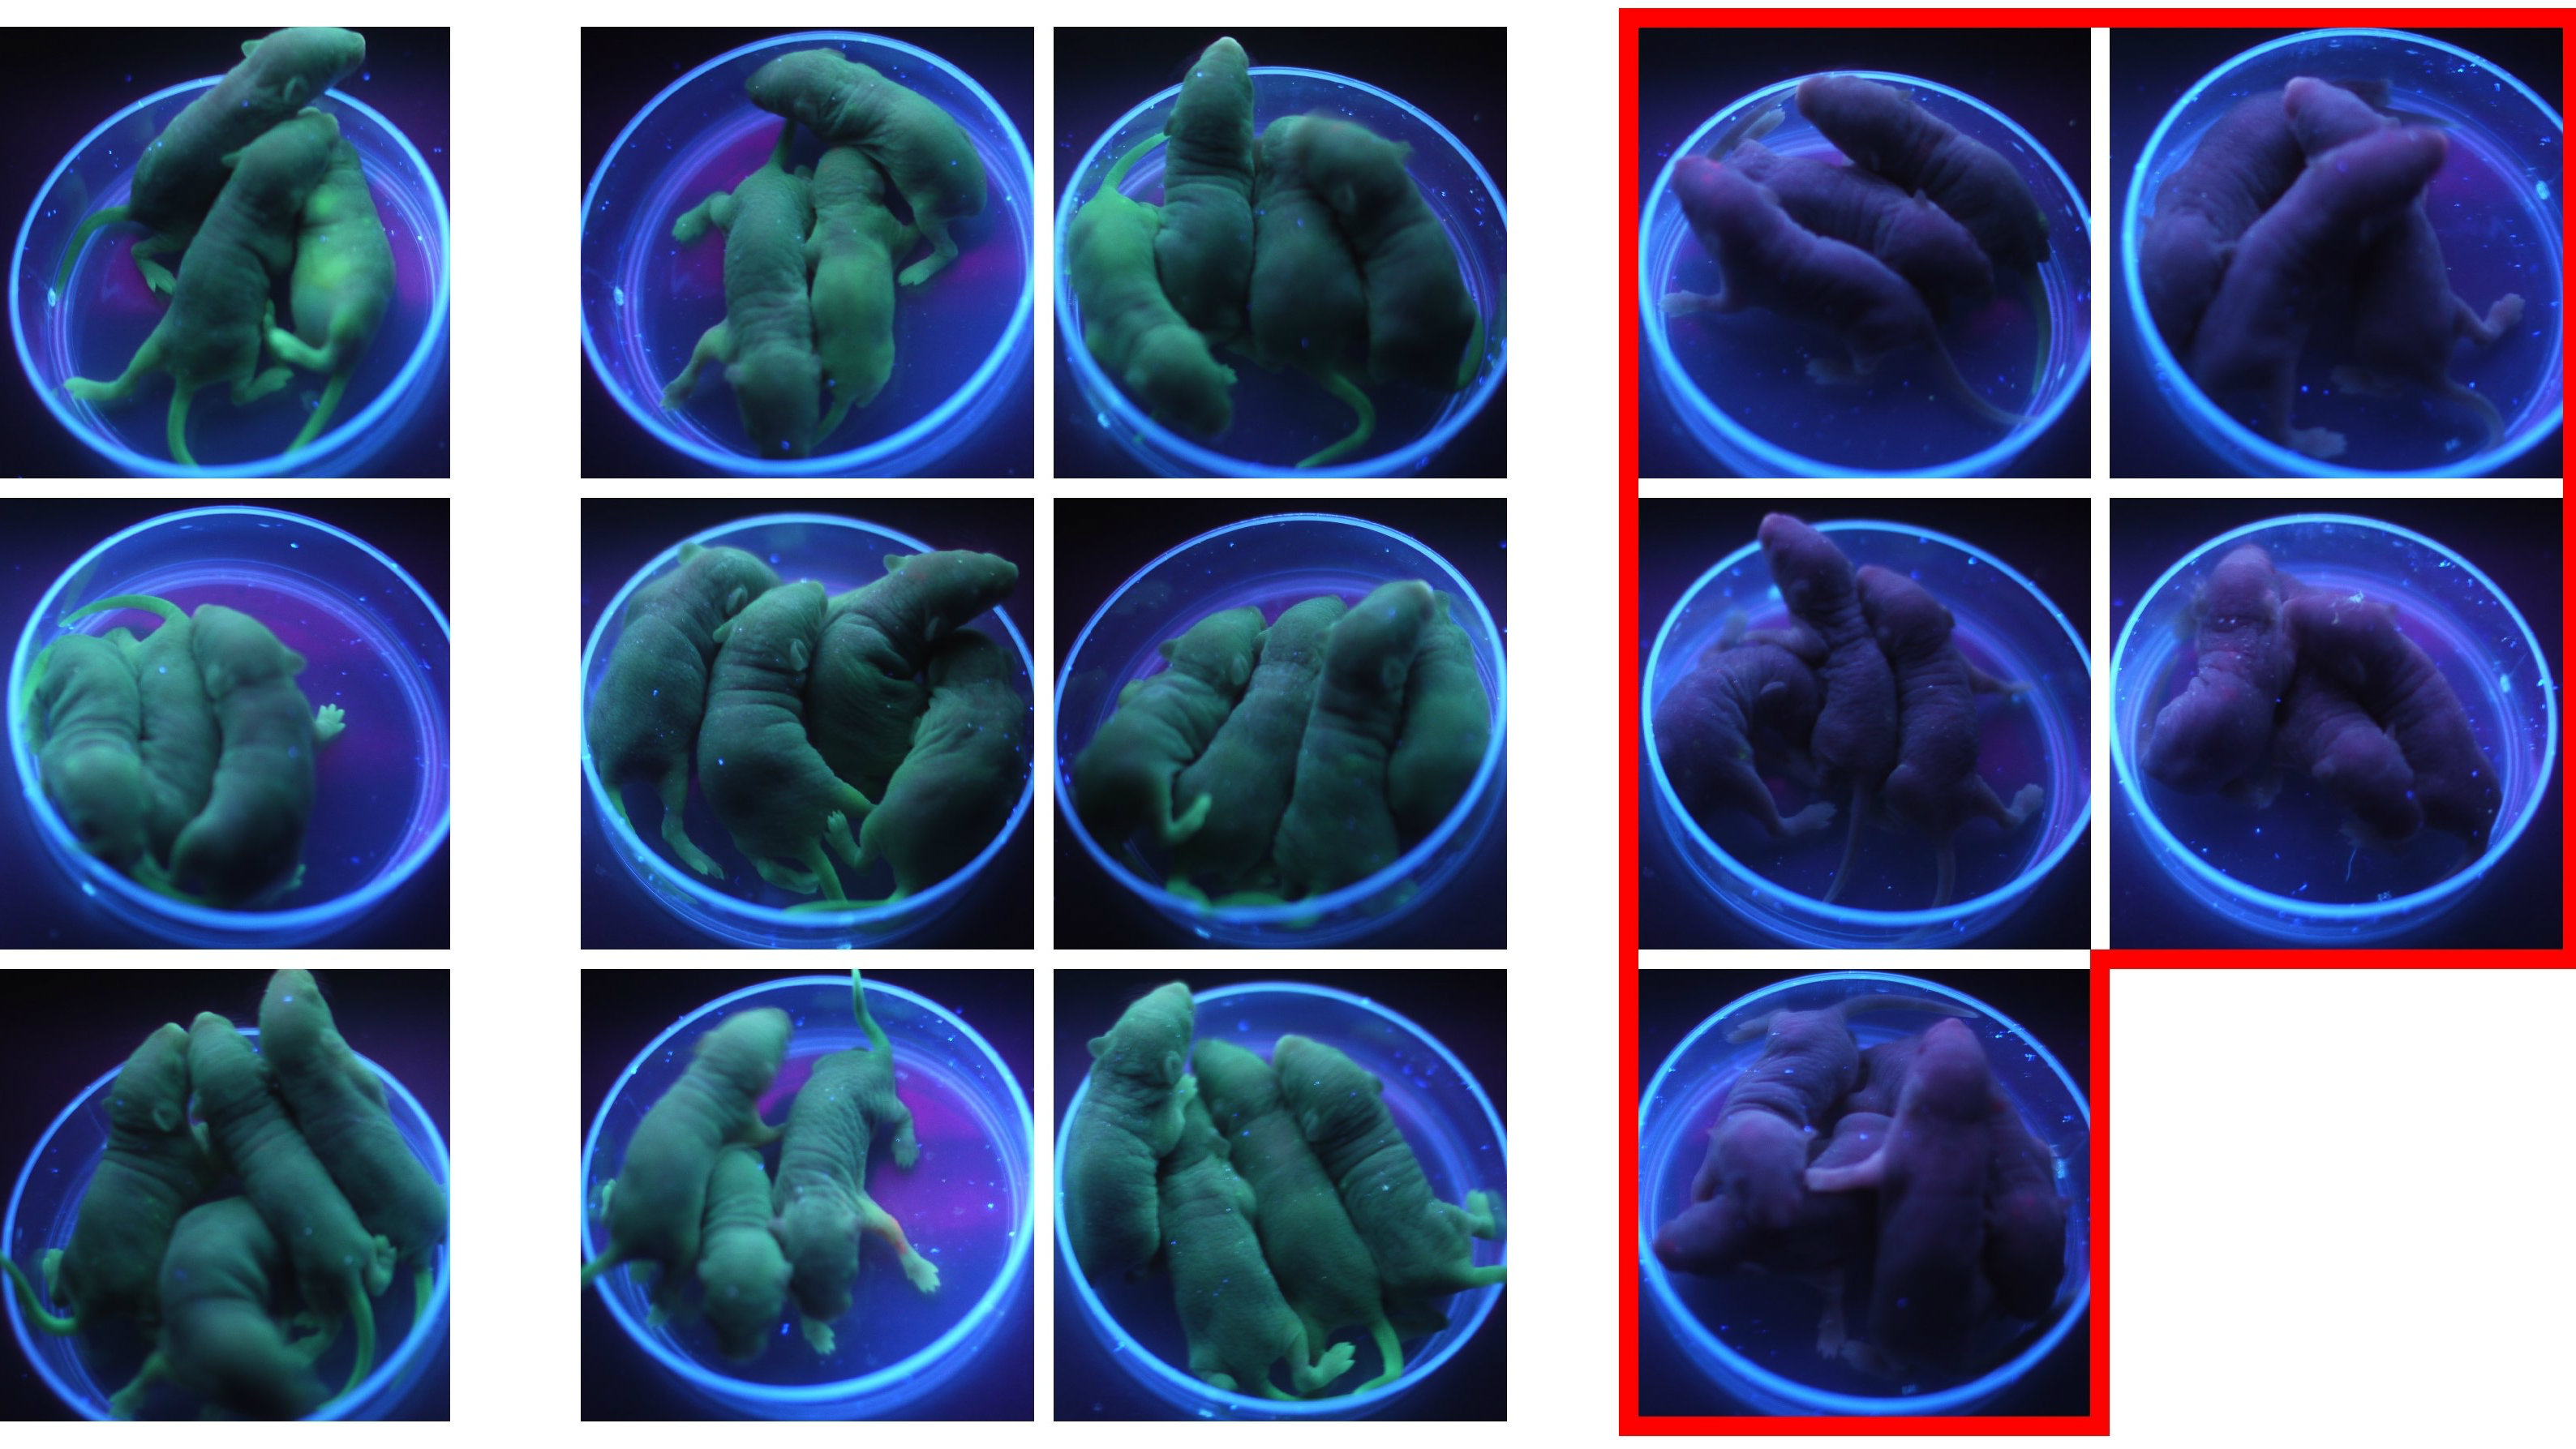 Gene edited mice